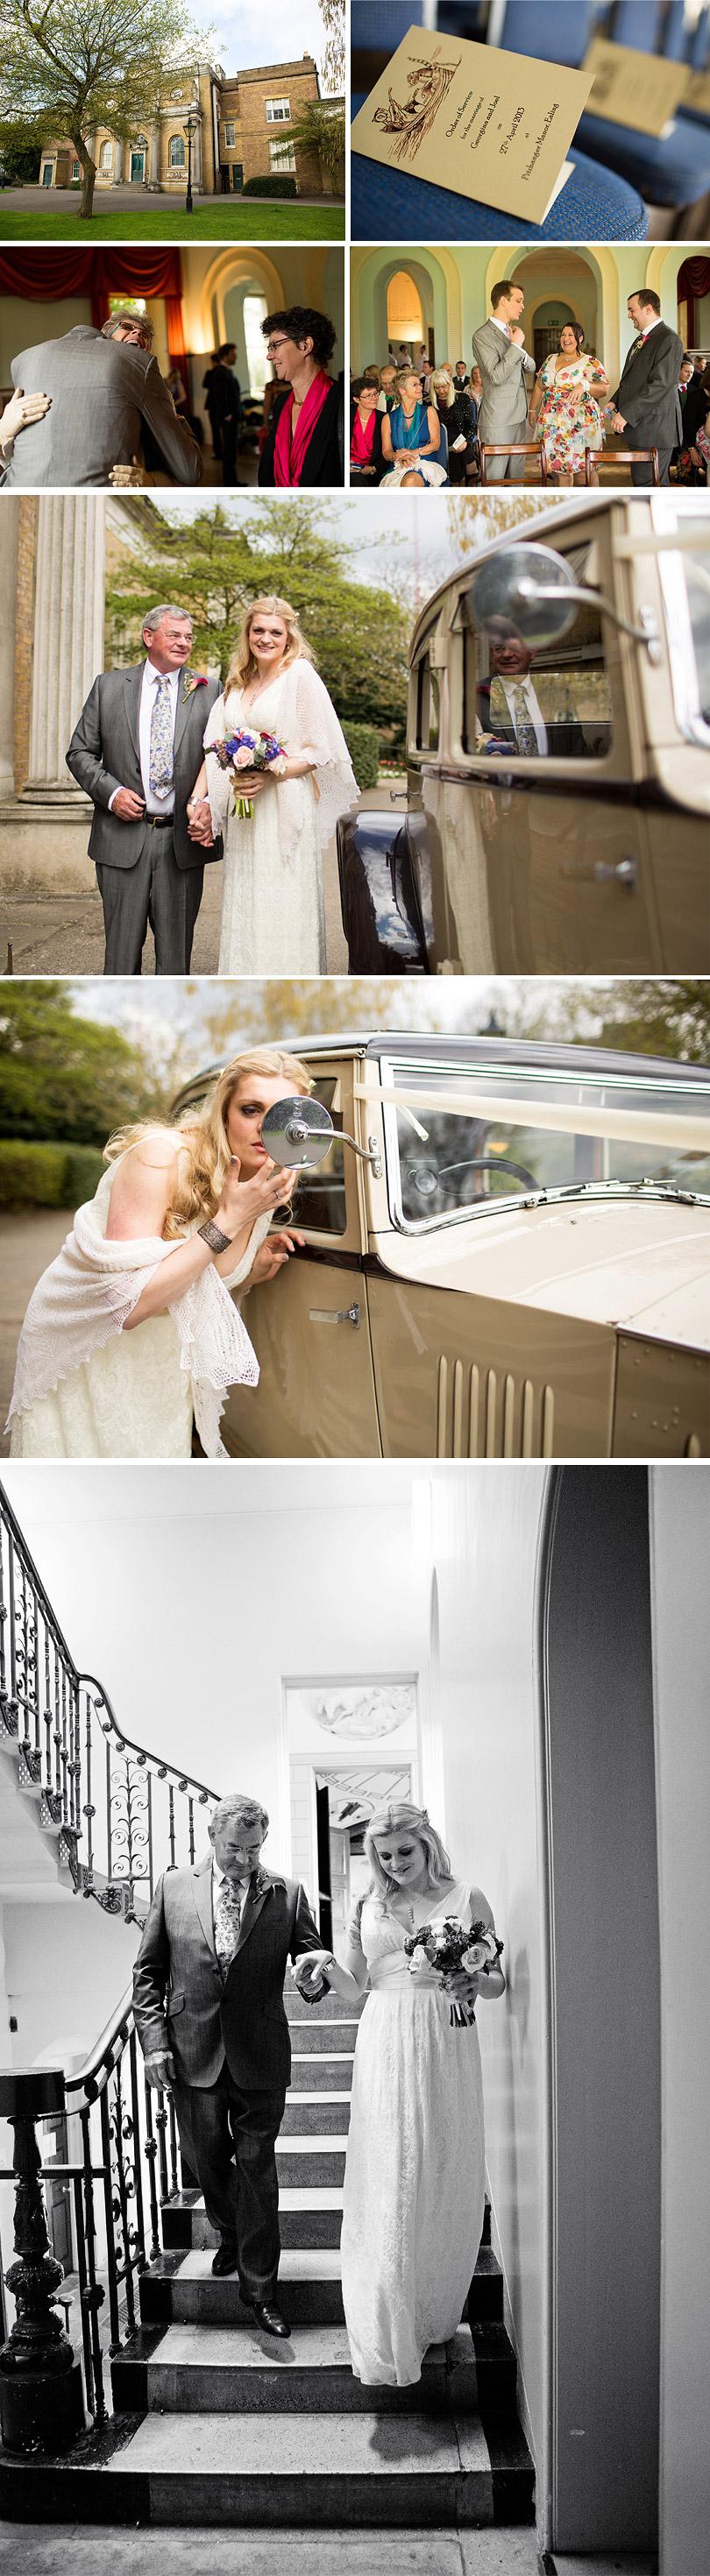 PM-Gallery-Ealing-Wedding-3.jpg